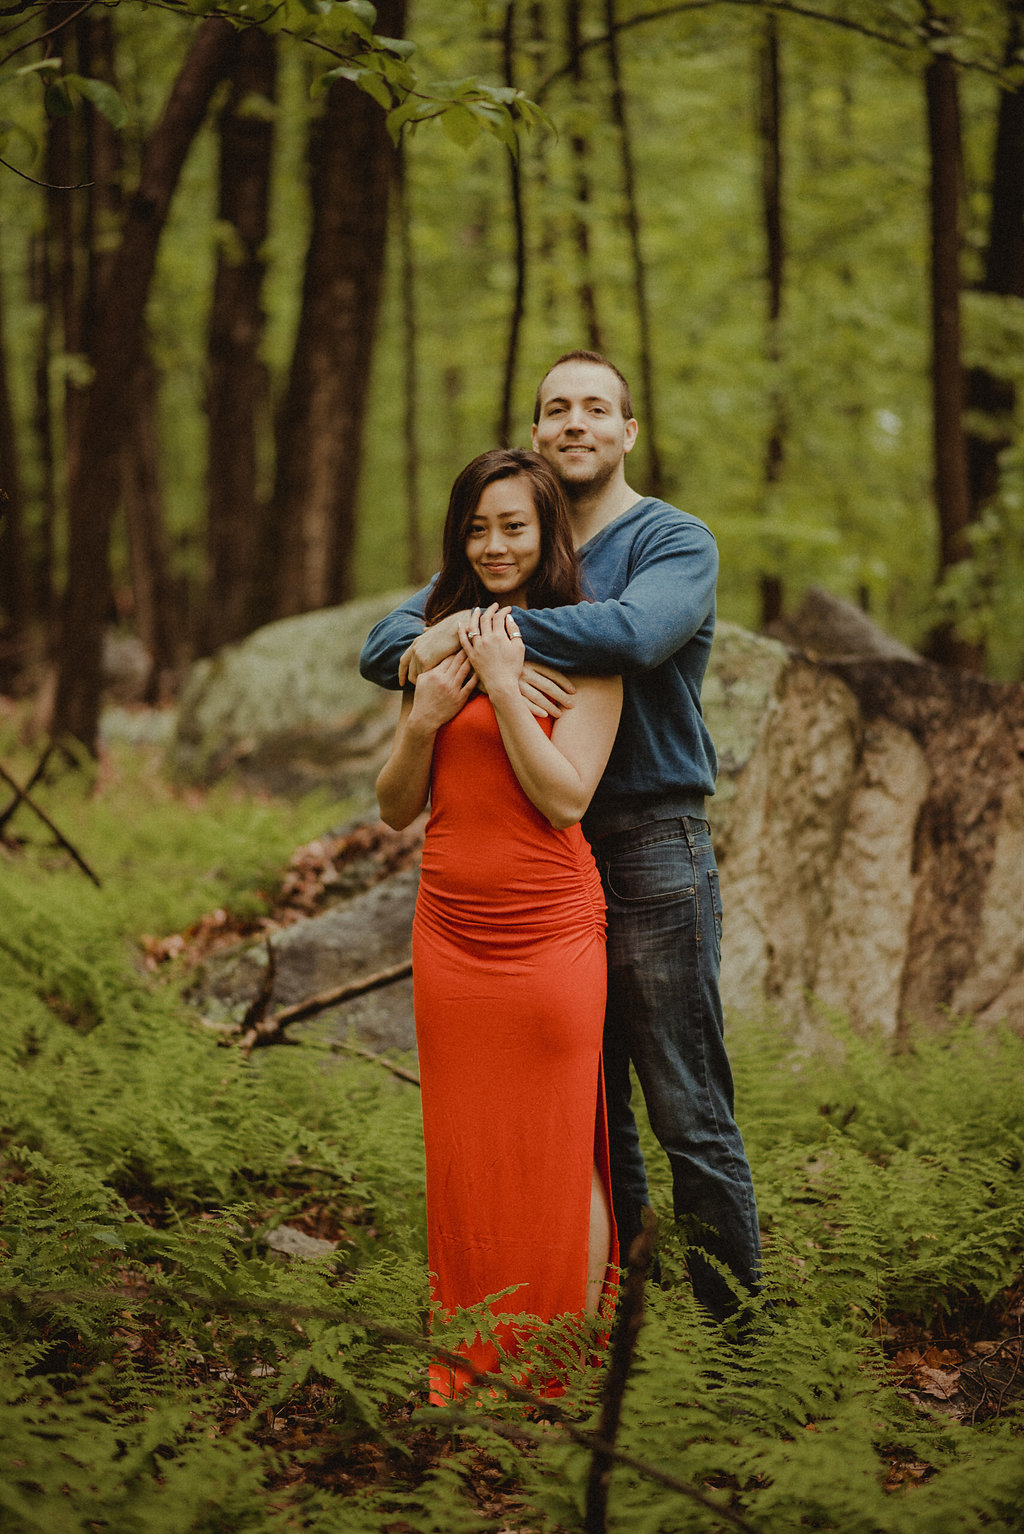 Man hugging woman in red dress.